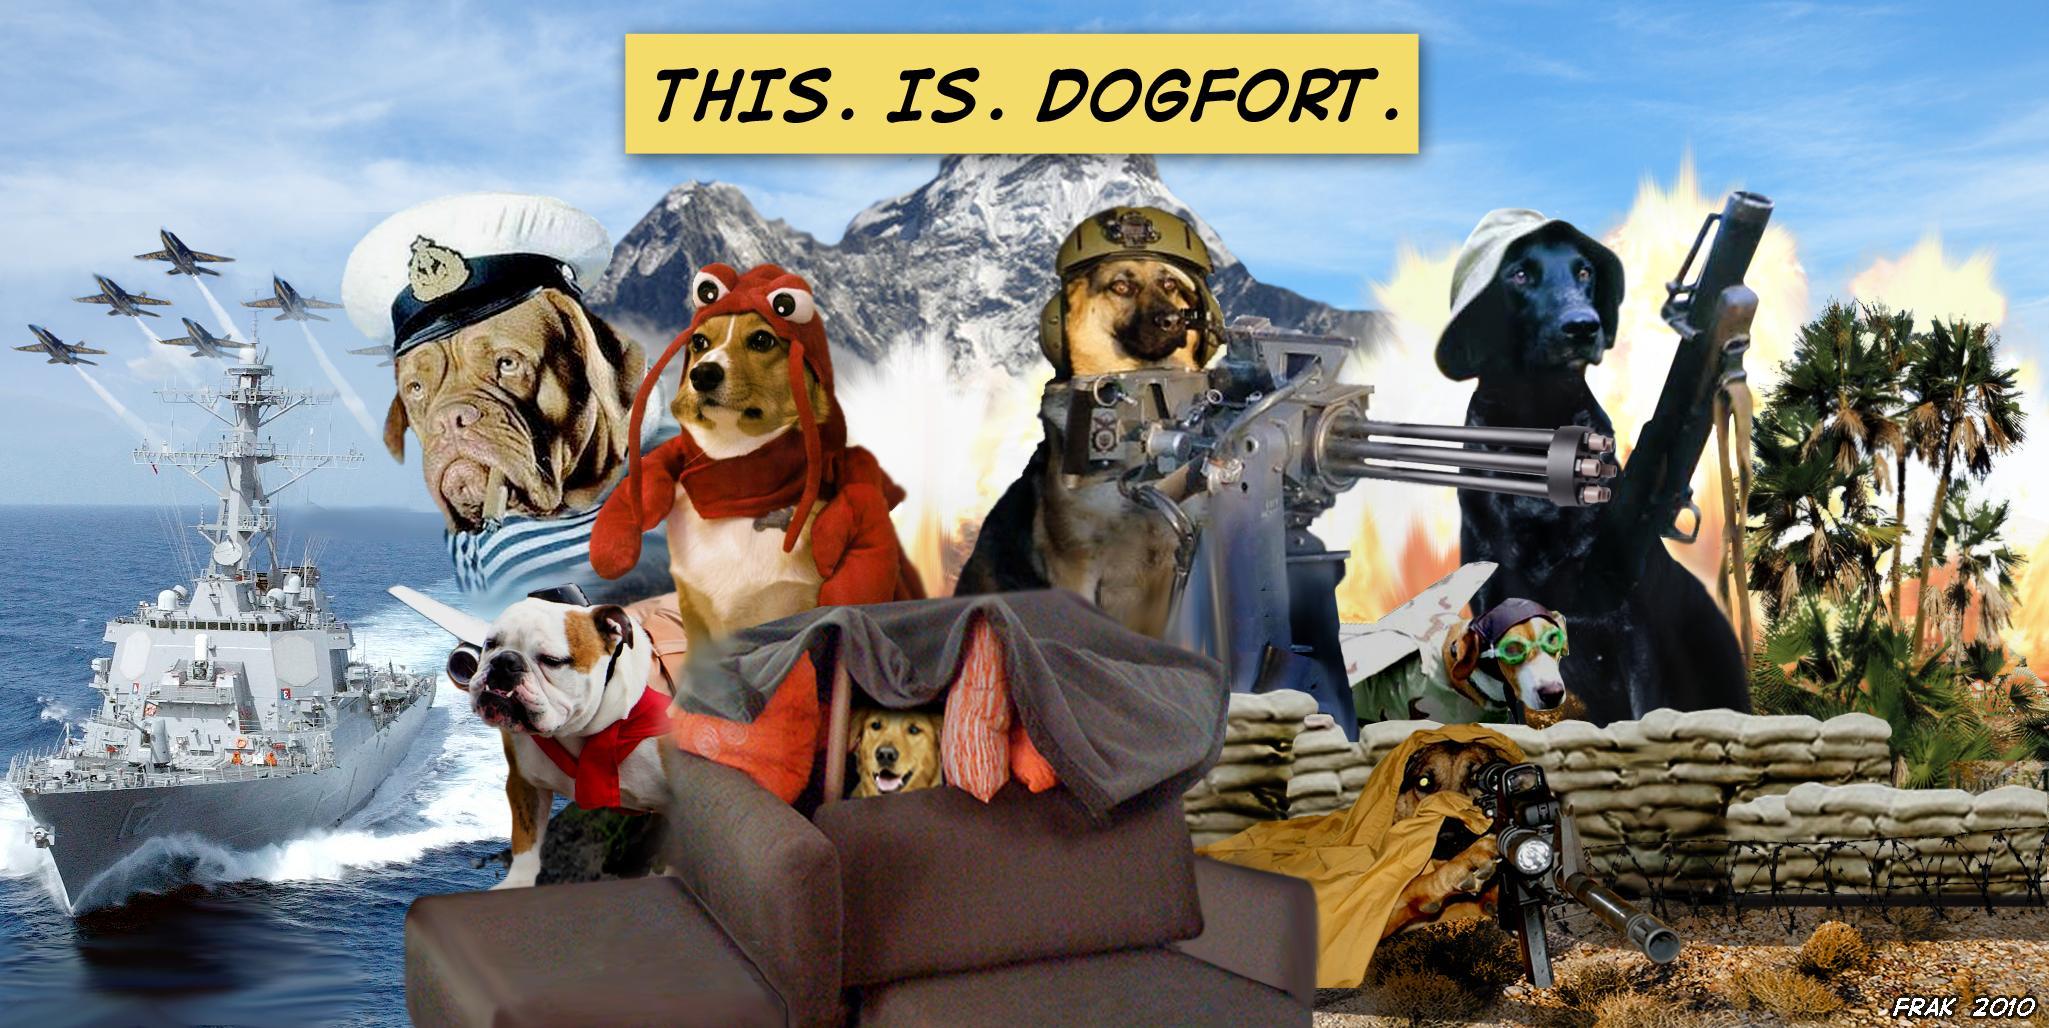 meme ftw   Dog Fort desktop wallpaper Available here 2049x1028